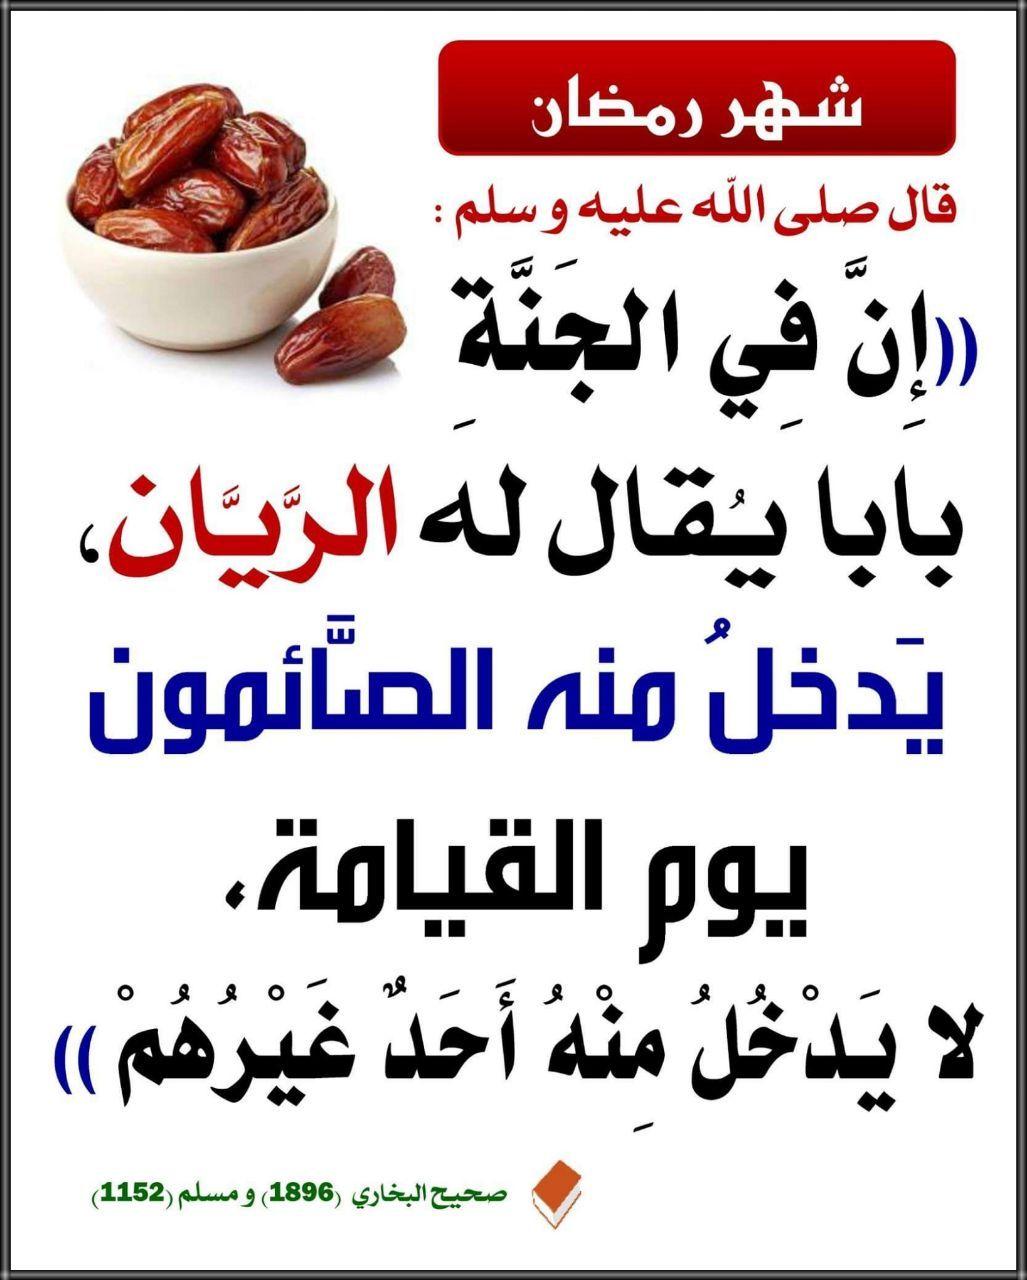 رمضان Ramadan Prayer Islam Facts Islamic Phrases